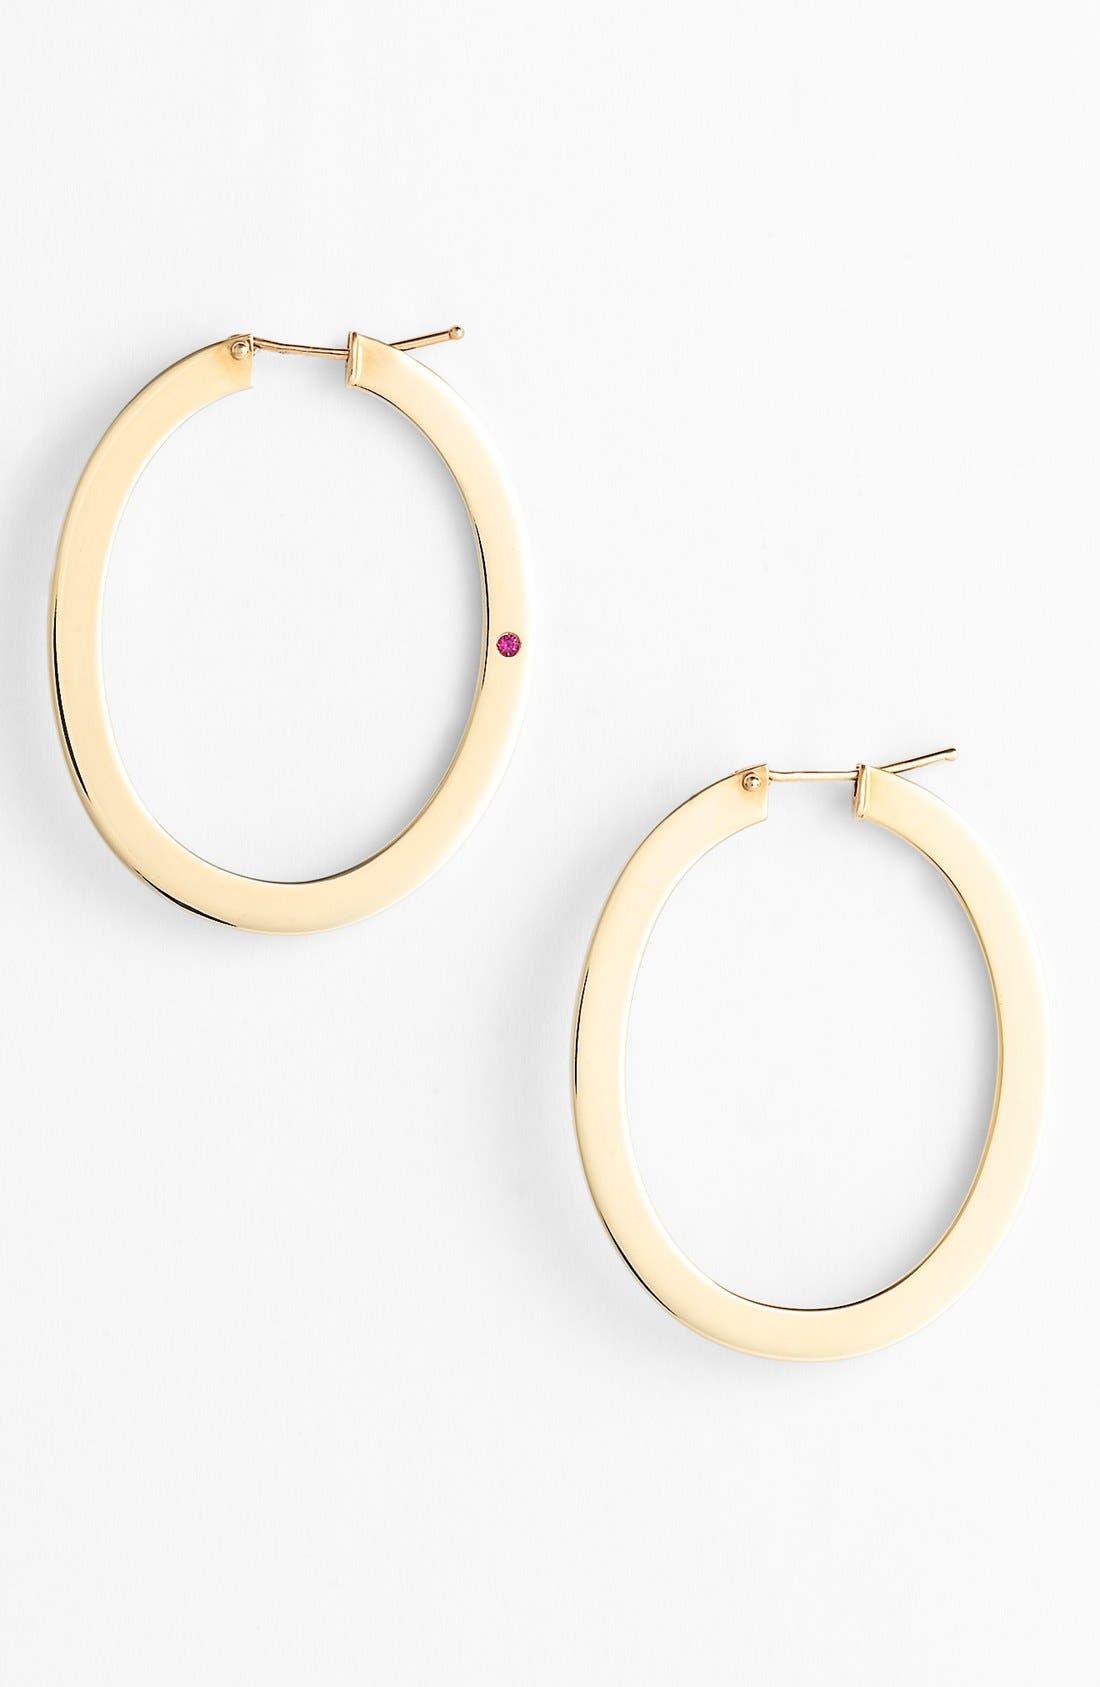 Main Image - Roberto Coin Large Flat Hoop Earrings